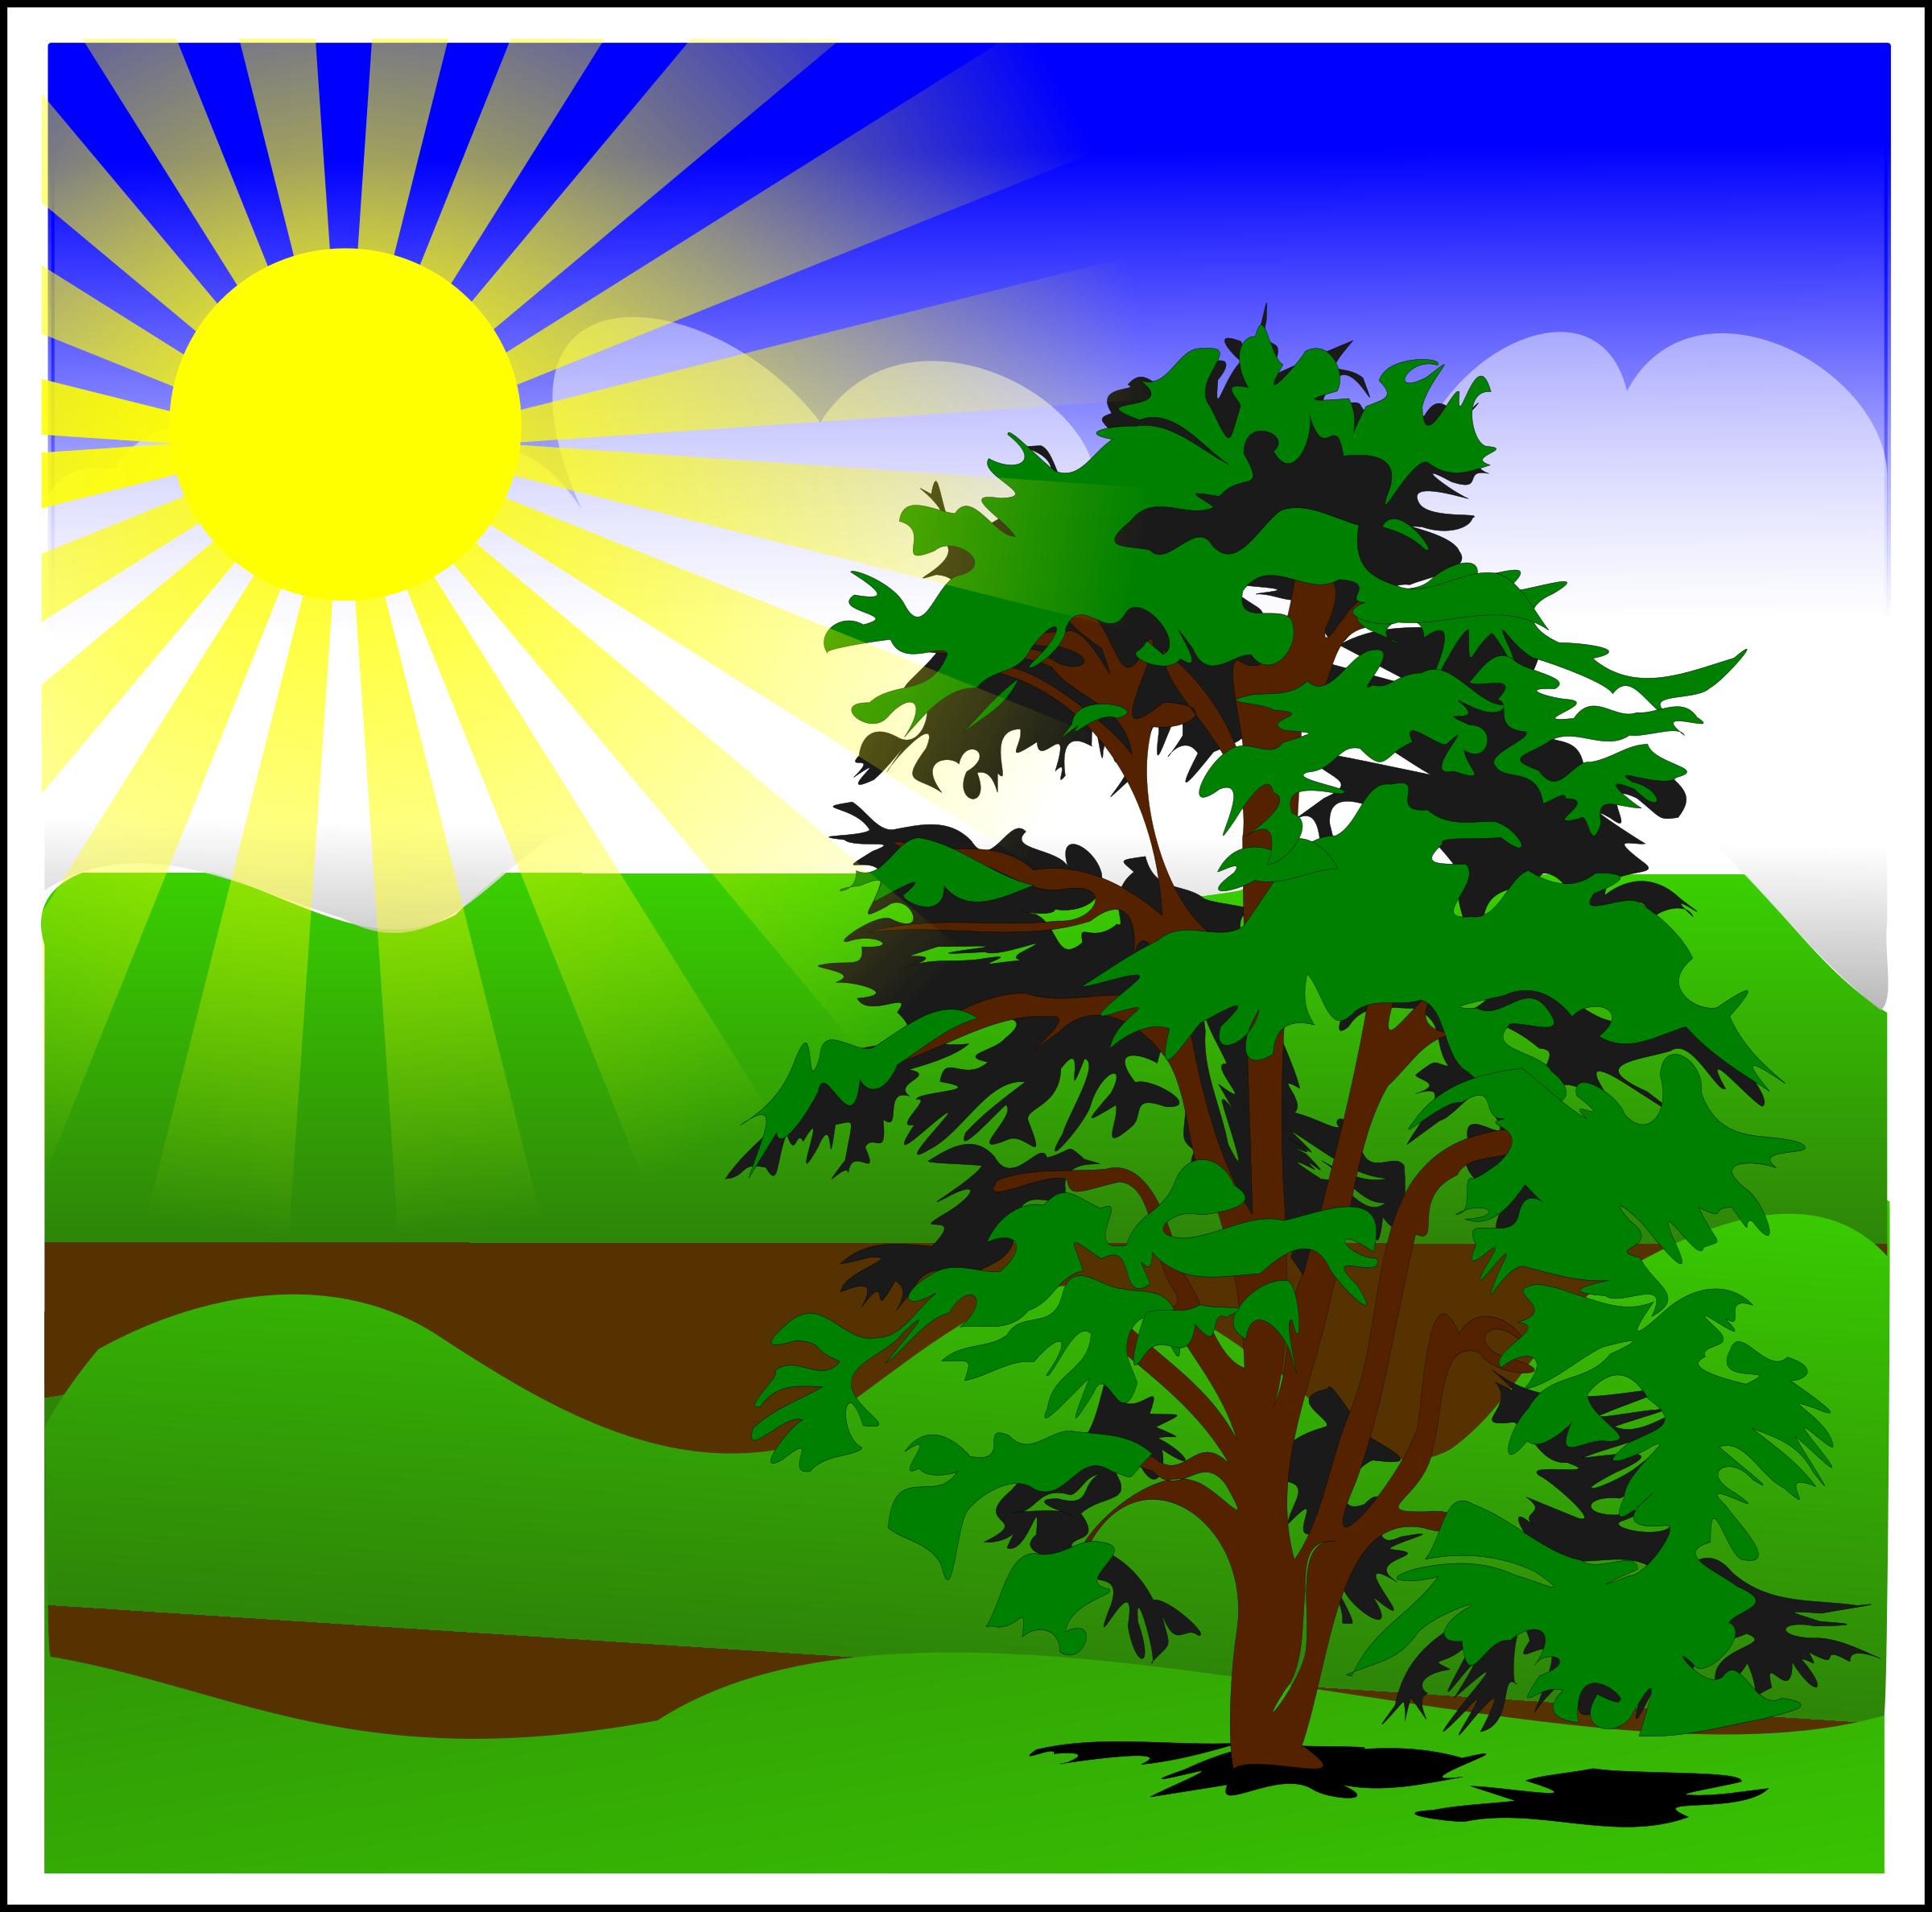 Sunlight Adventist Vegetarian Diabetics